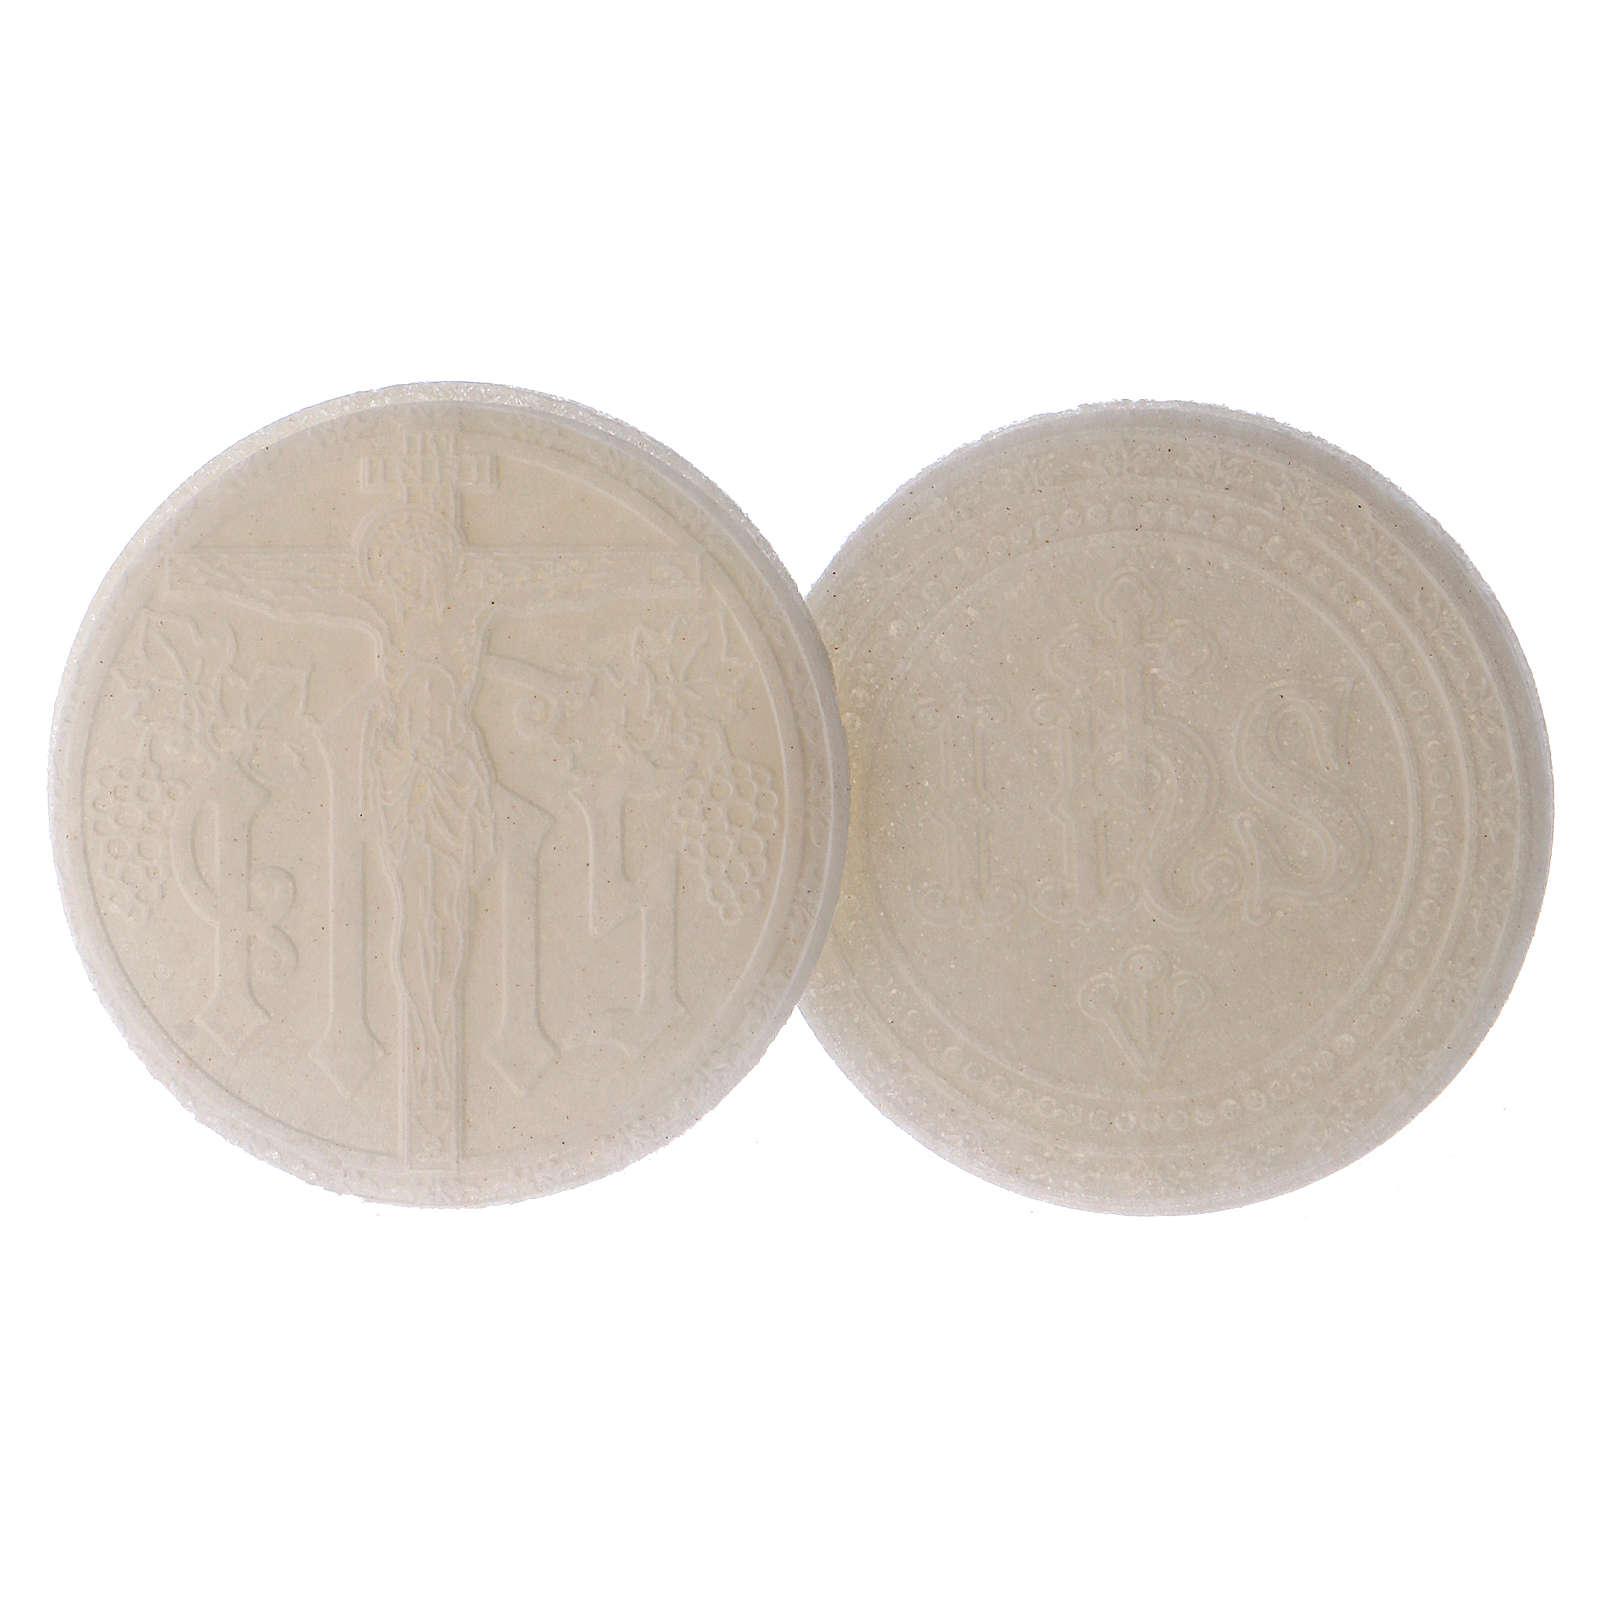 Große Hostien (Ostia Magna) 7,5 cm 25 Stück 3